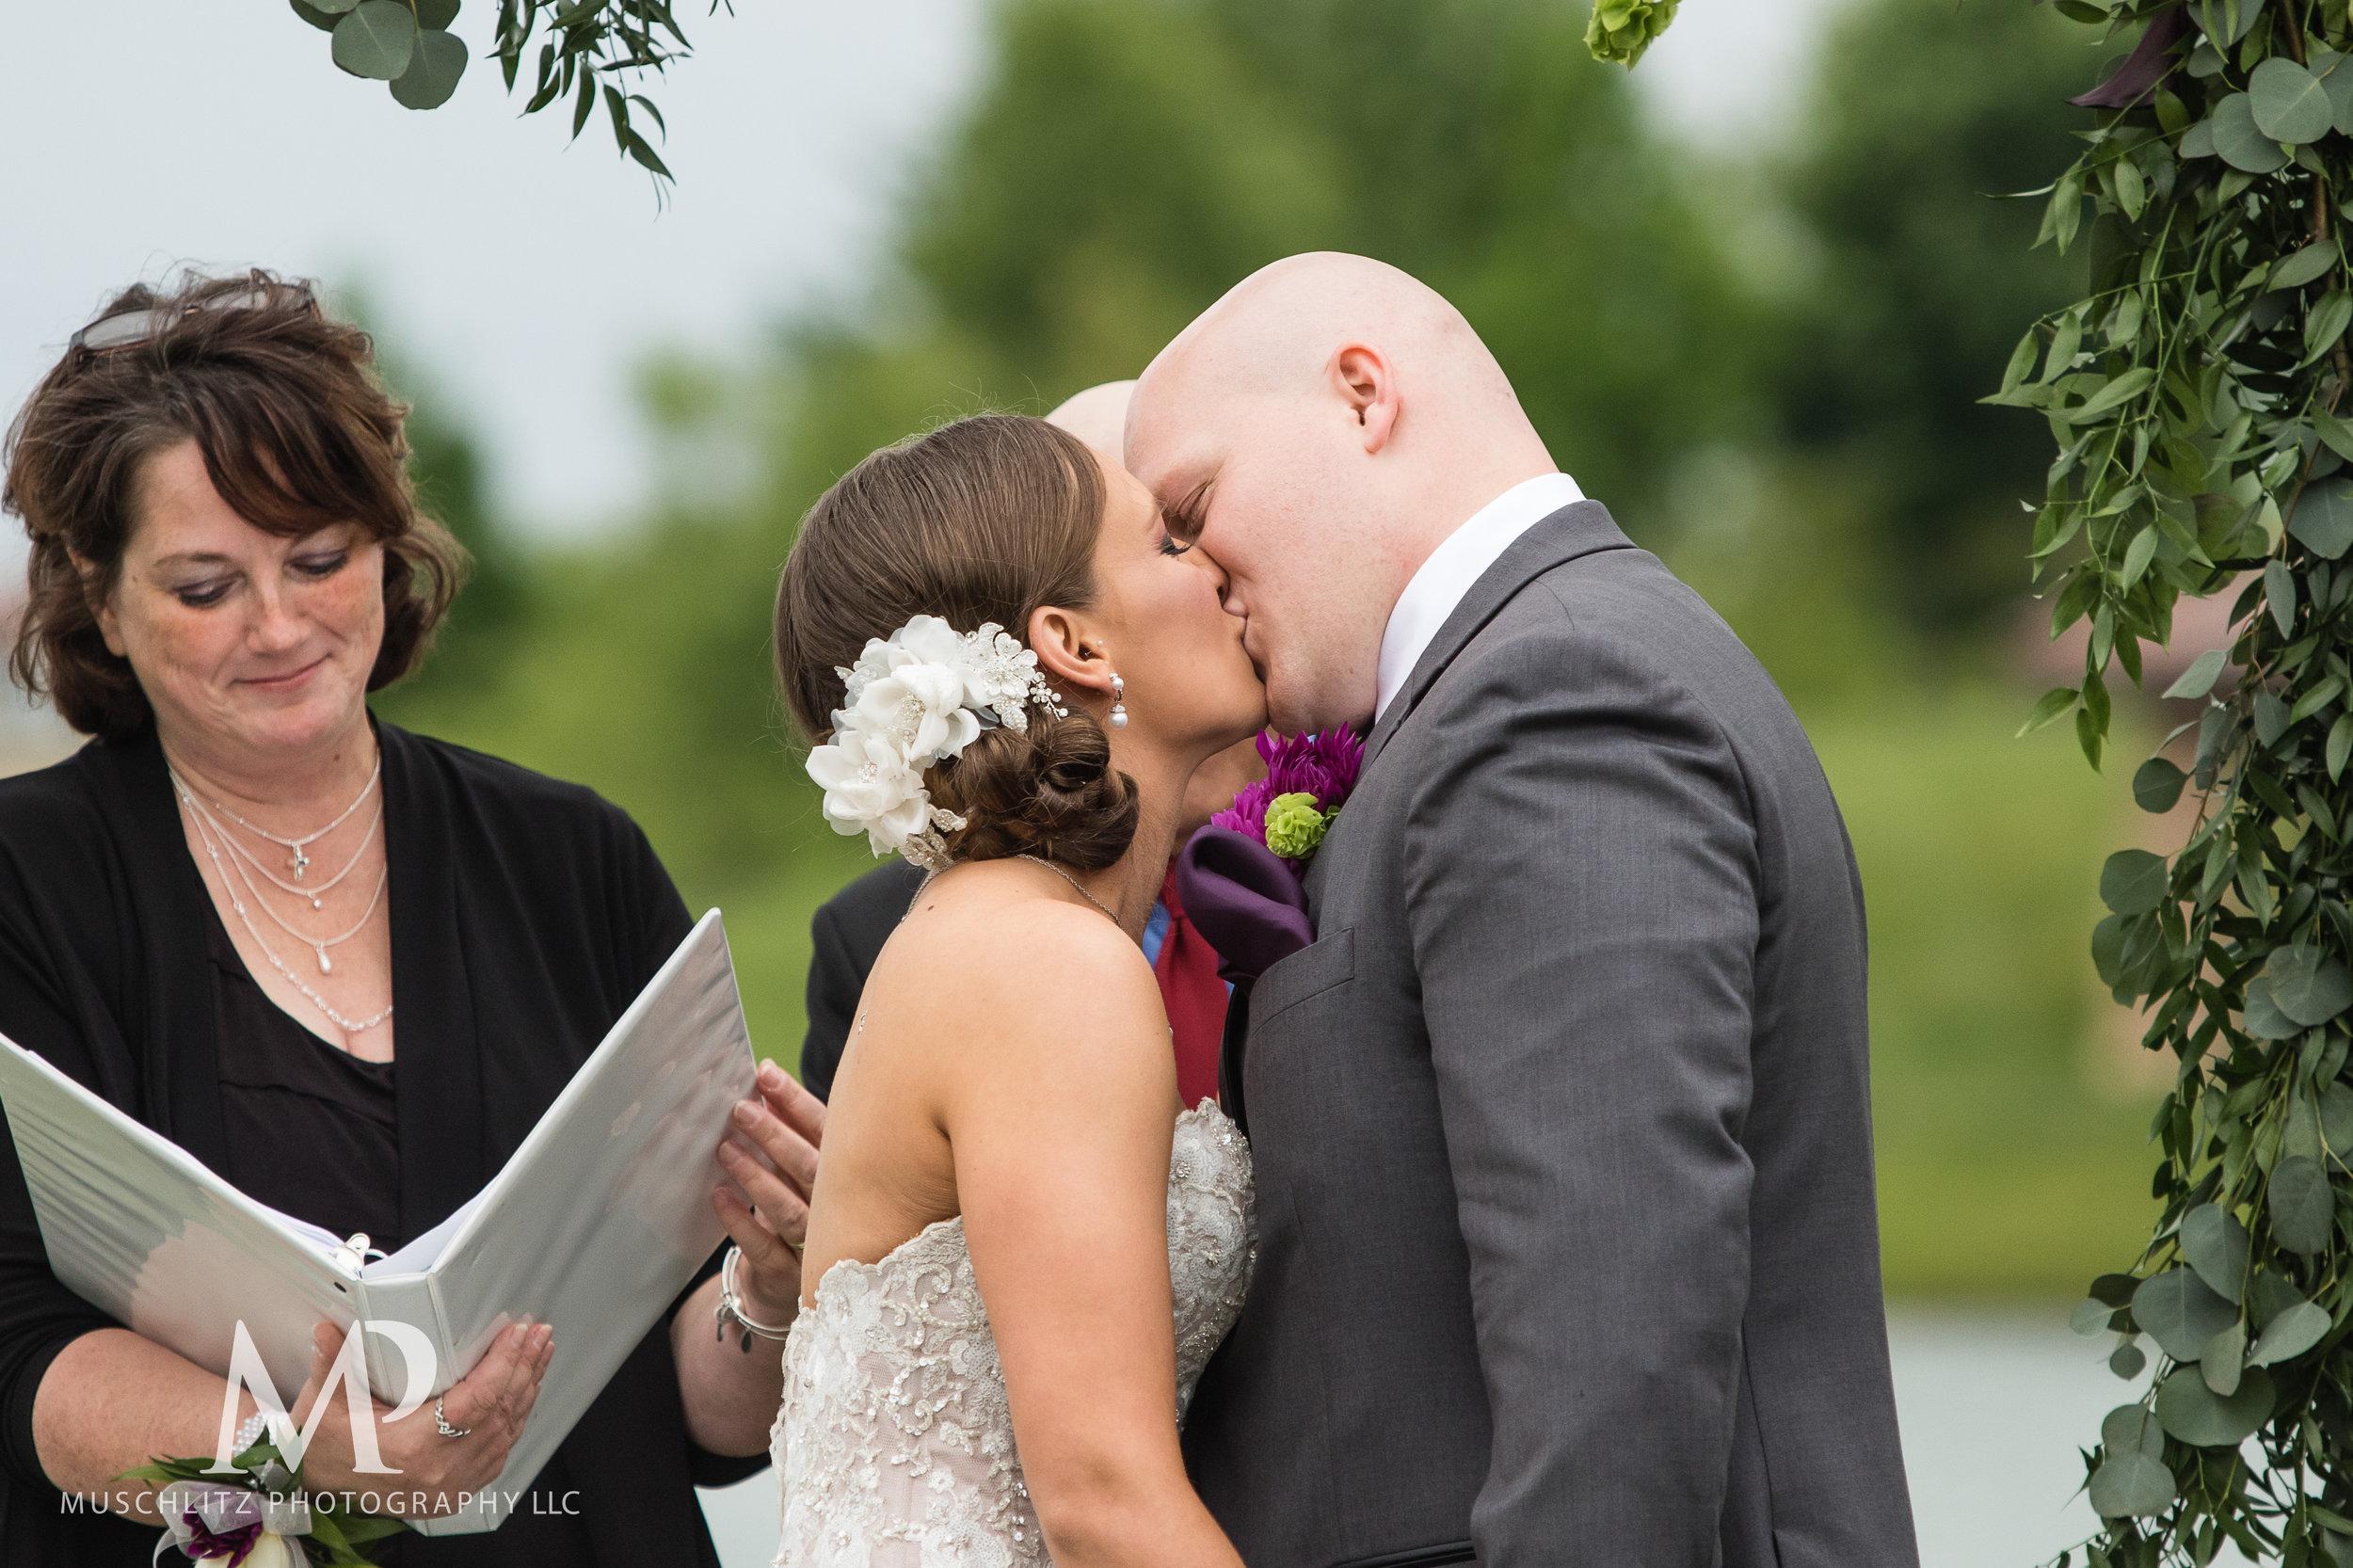 club-at-corazon-wedding-ceremony-reception-columbus-dublin-ohio-ohio-university-theme-043.JPG